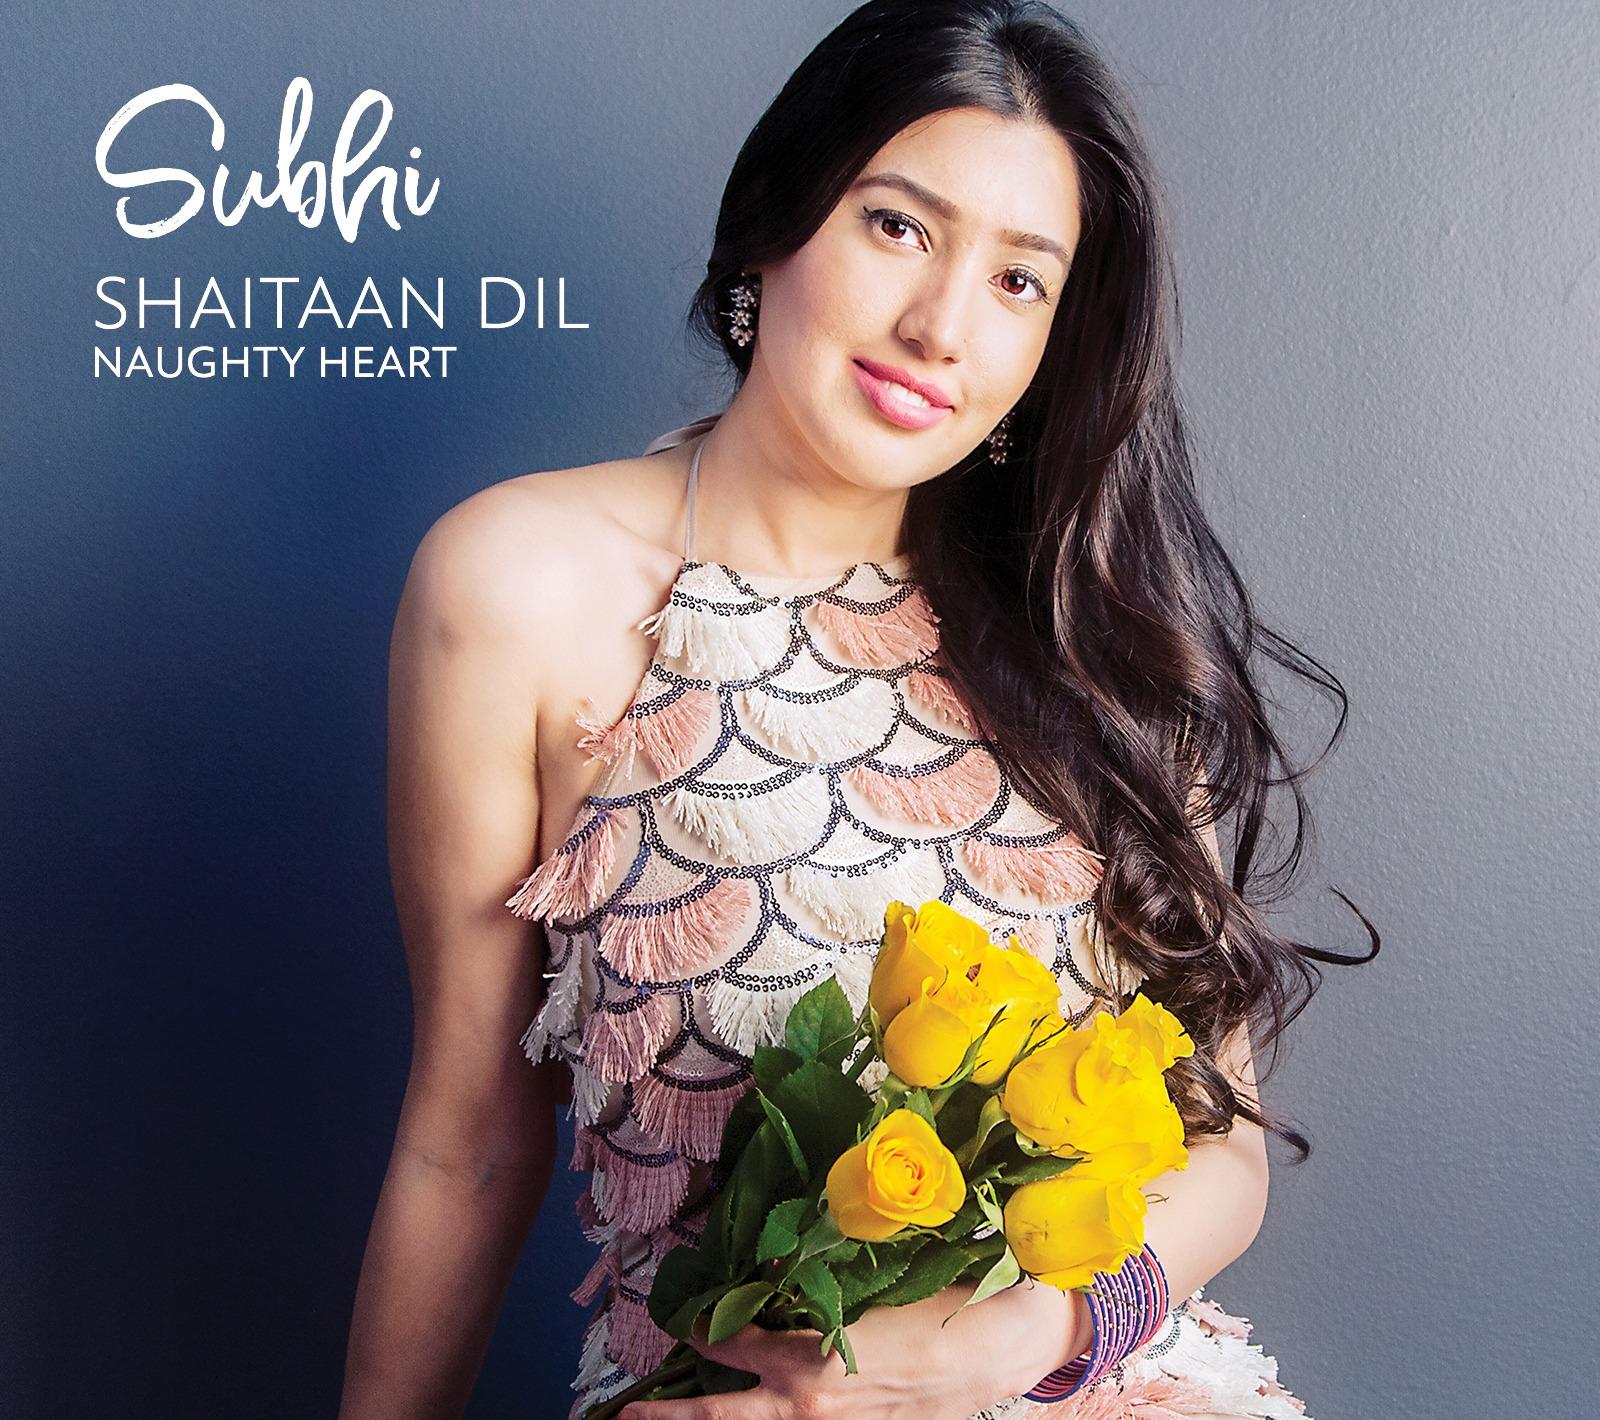 Subhi